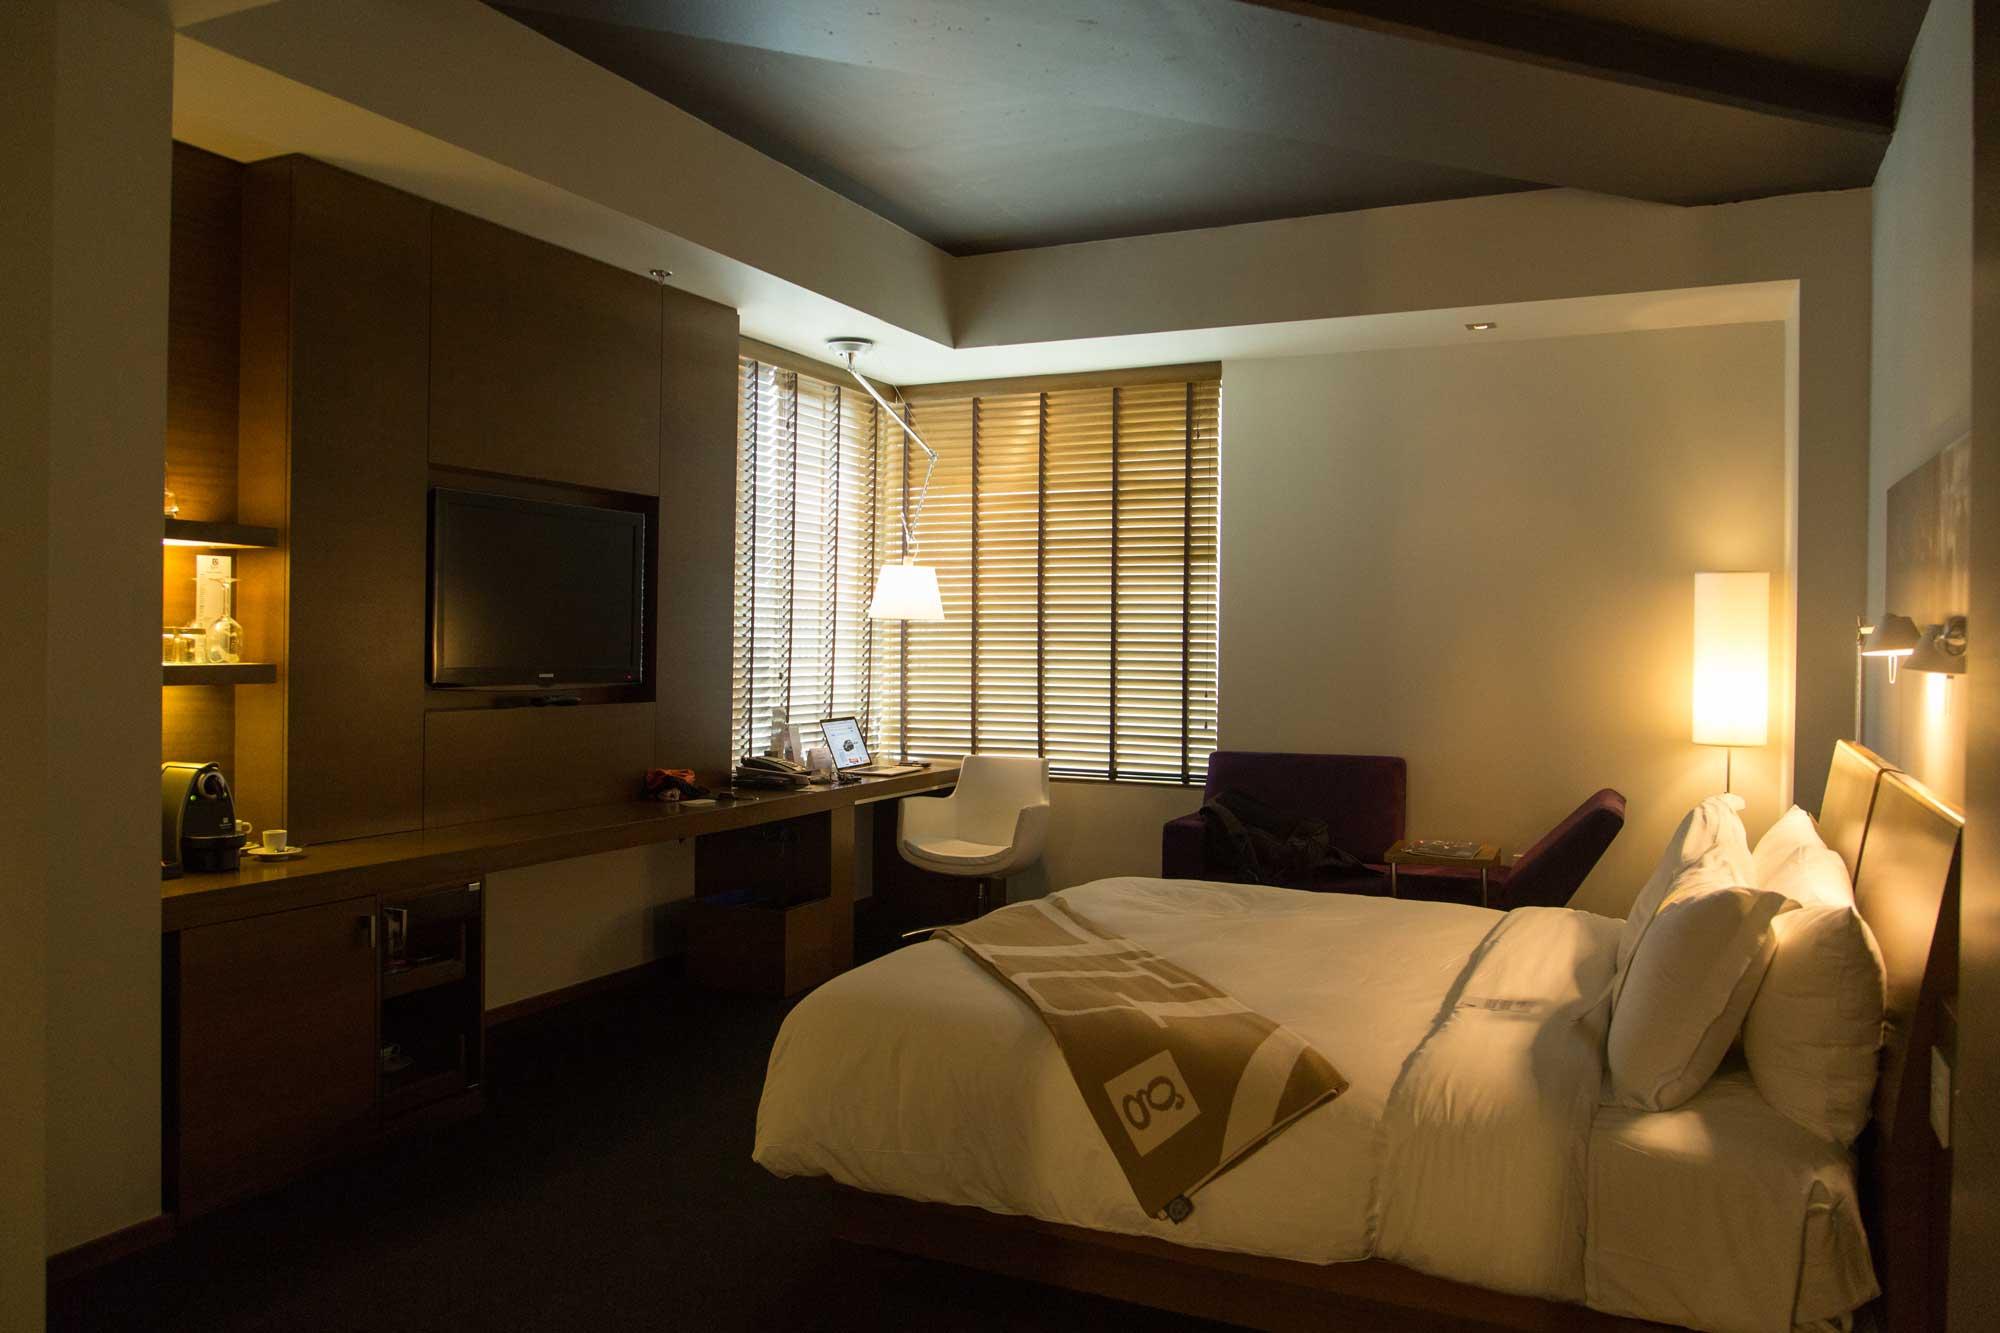 Le-Germain-Hotel-Calgary-9002.jpg